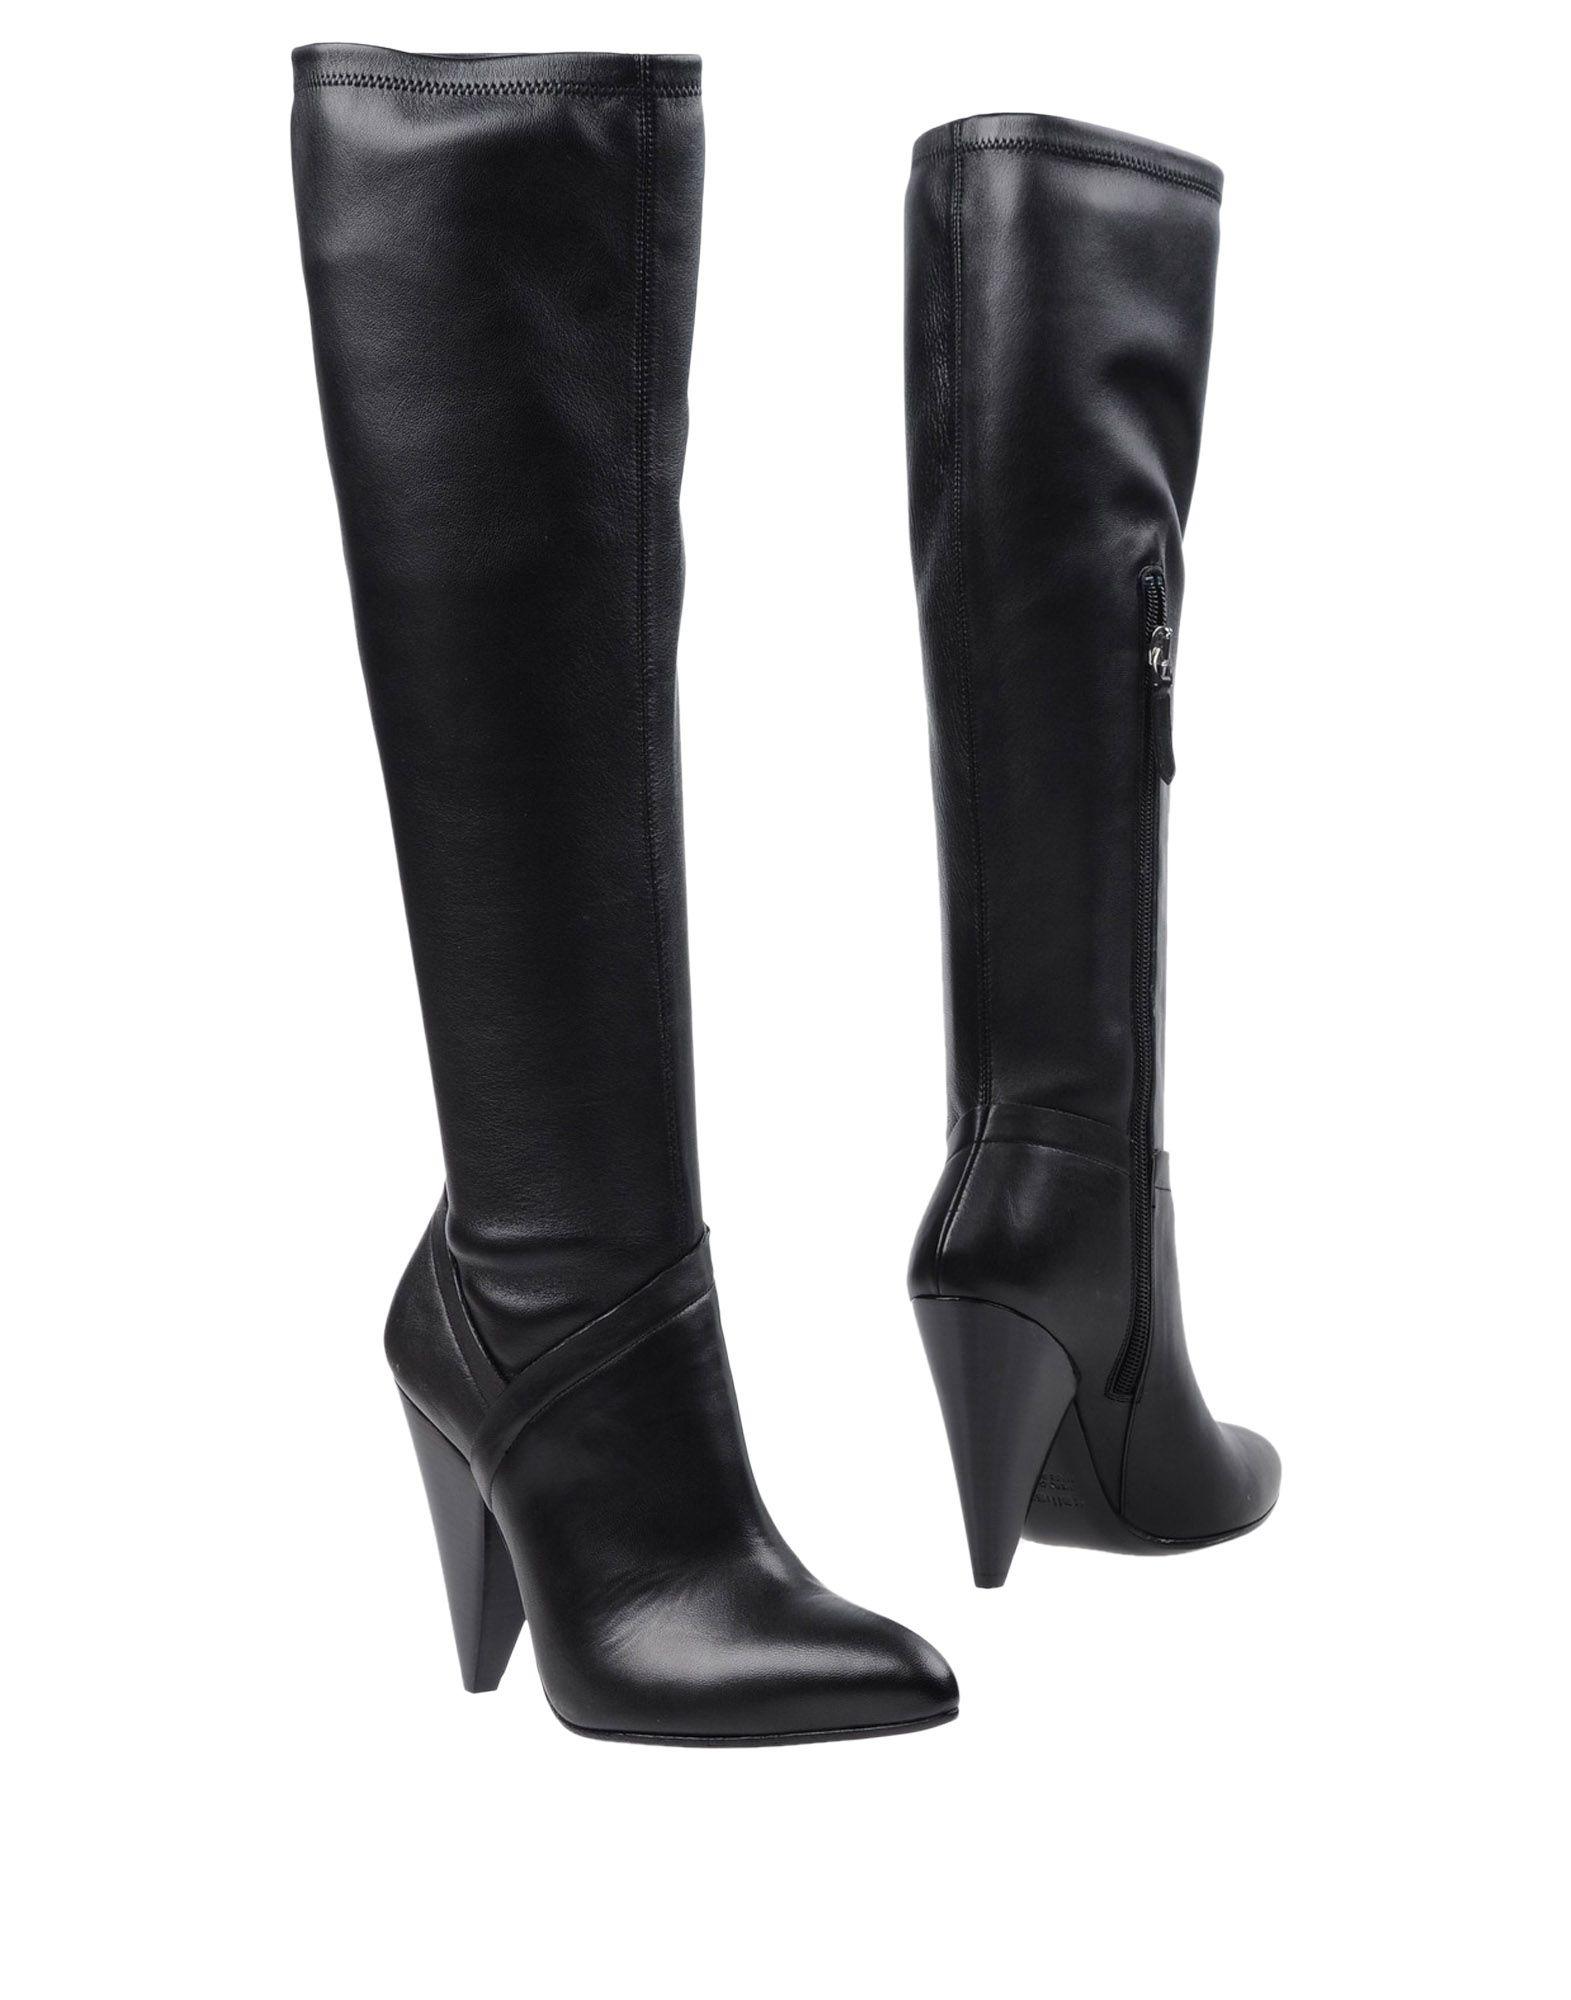 Kallistè Stiefel Damen  11363535AK Gute Qualität beliebte Schuhe